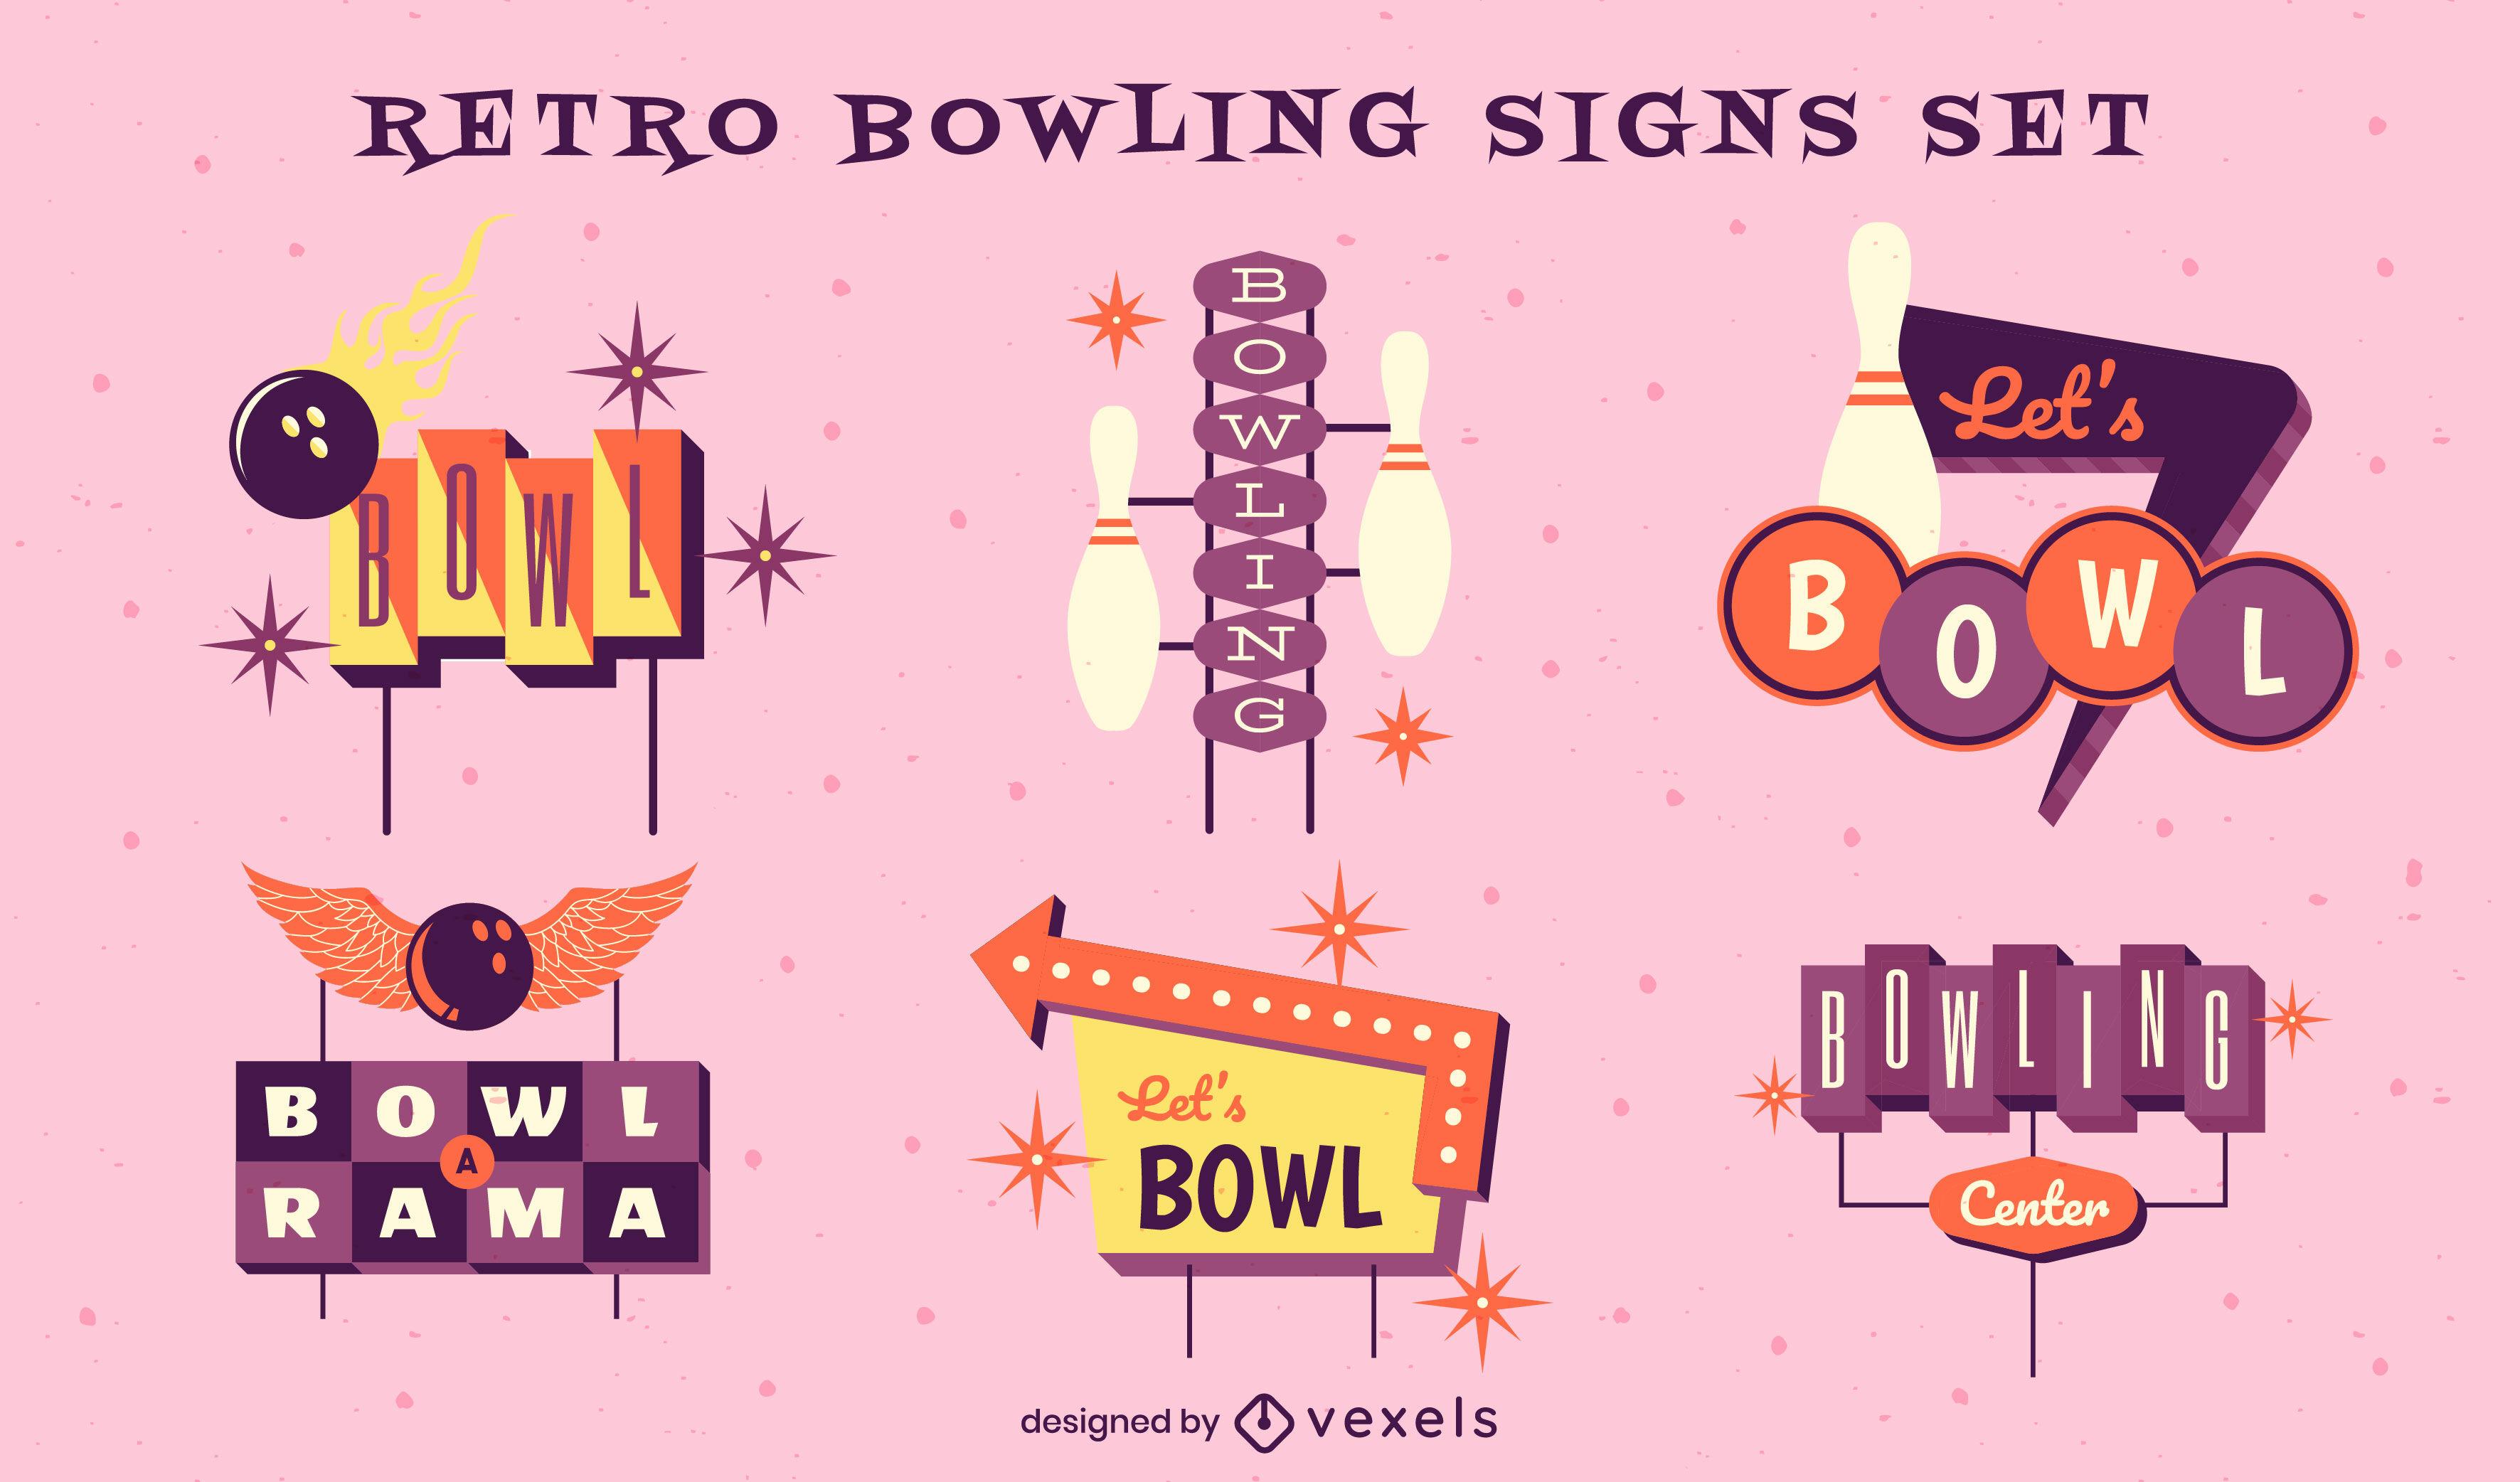 Vintage bowling signs semi flat set